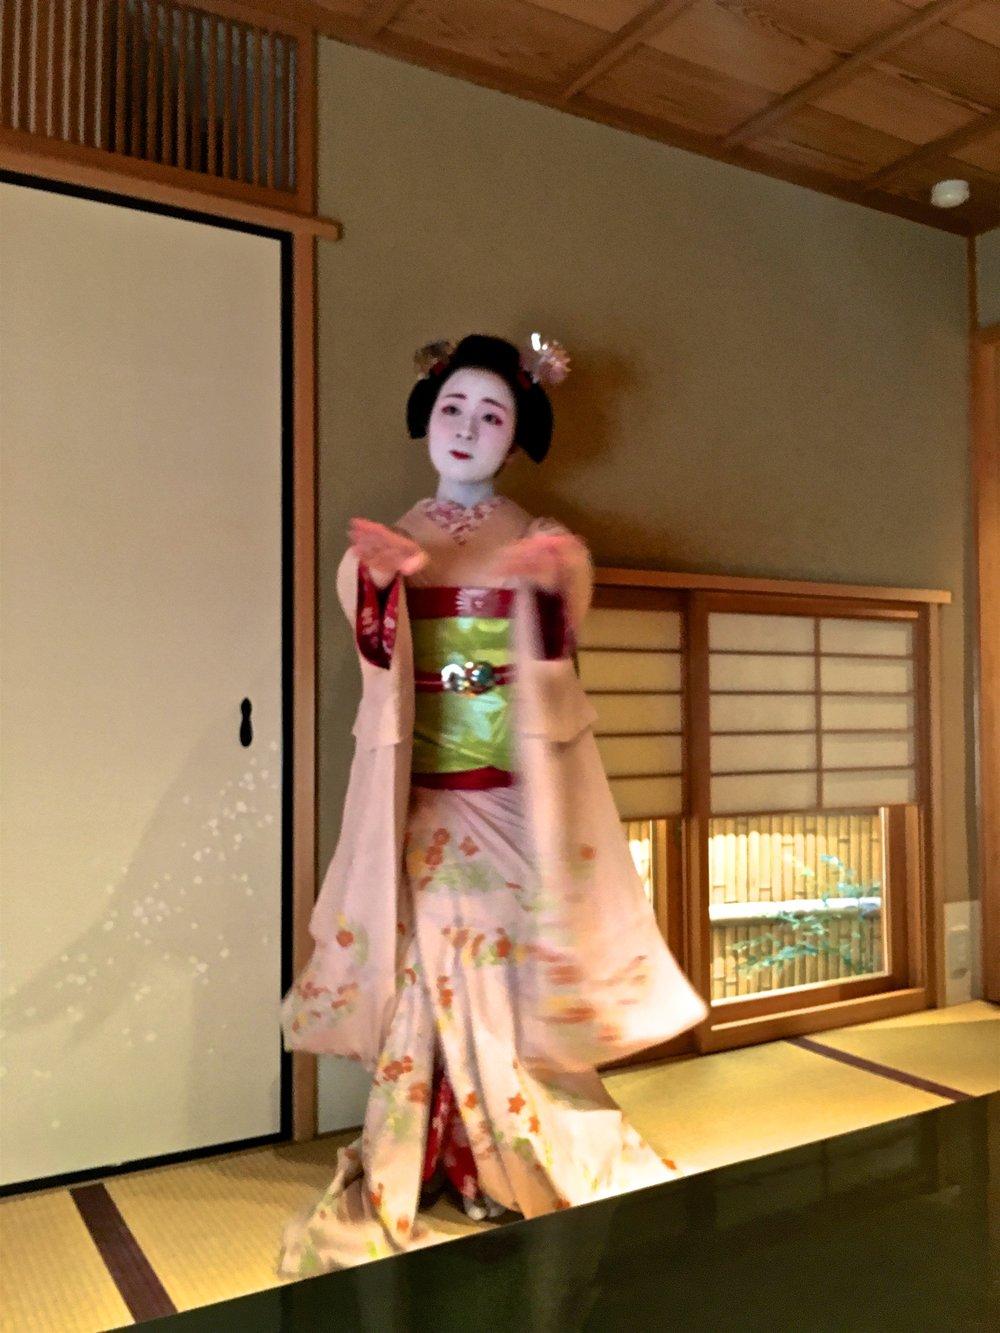 teri_Japan_Kyoto_Maiko_dinner_spiritedtable_photo3.jpg